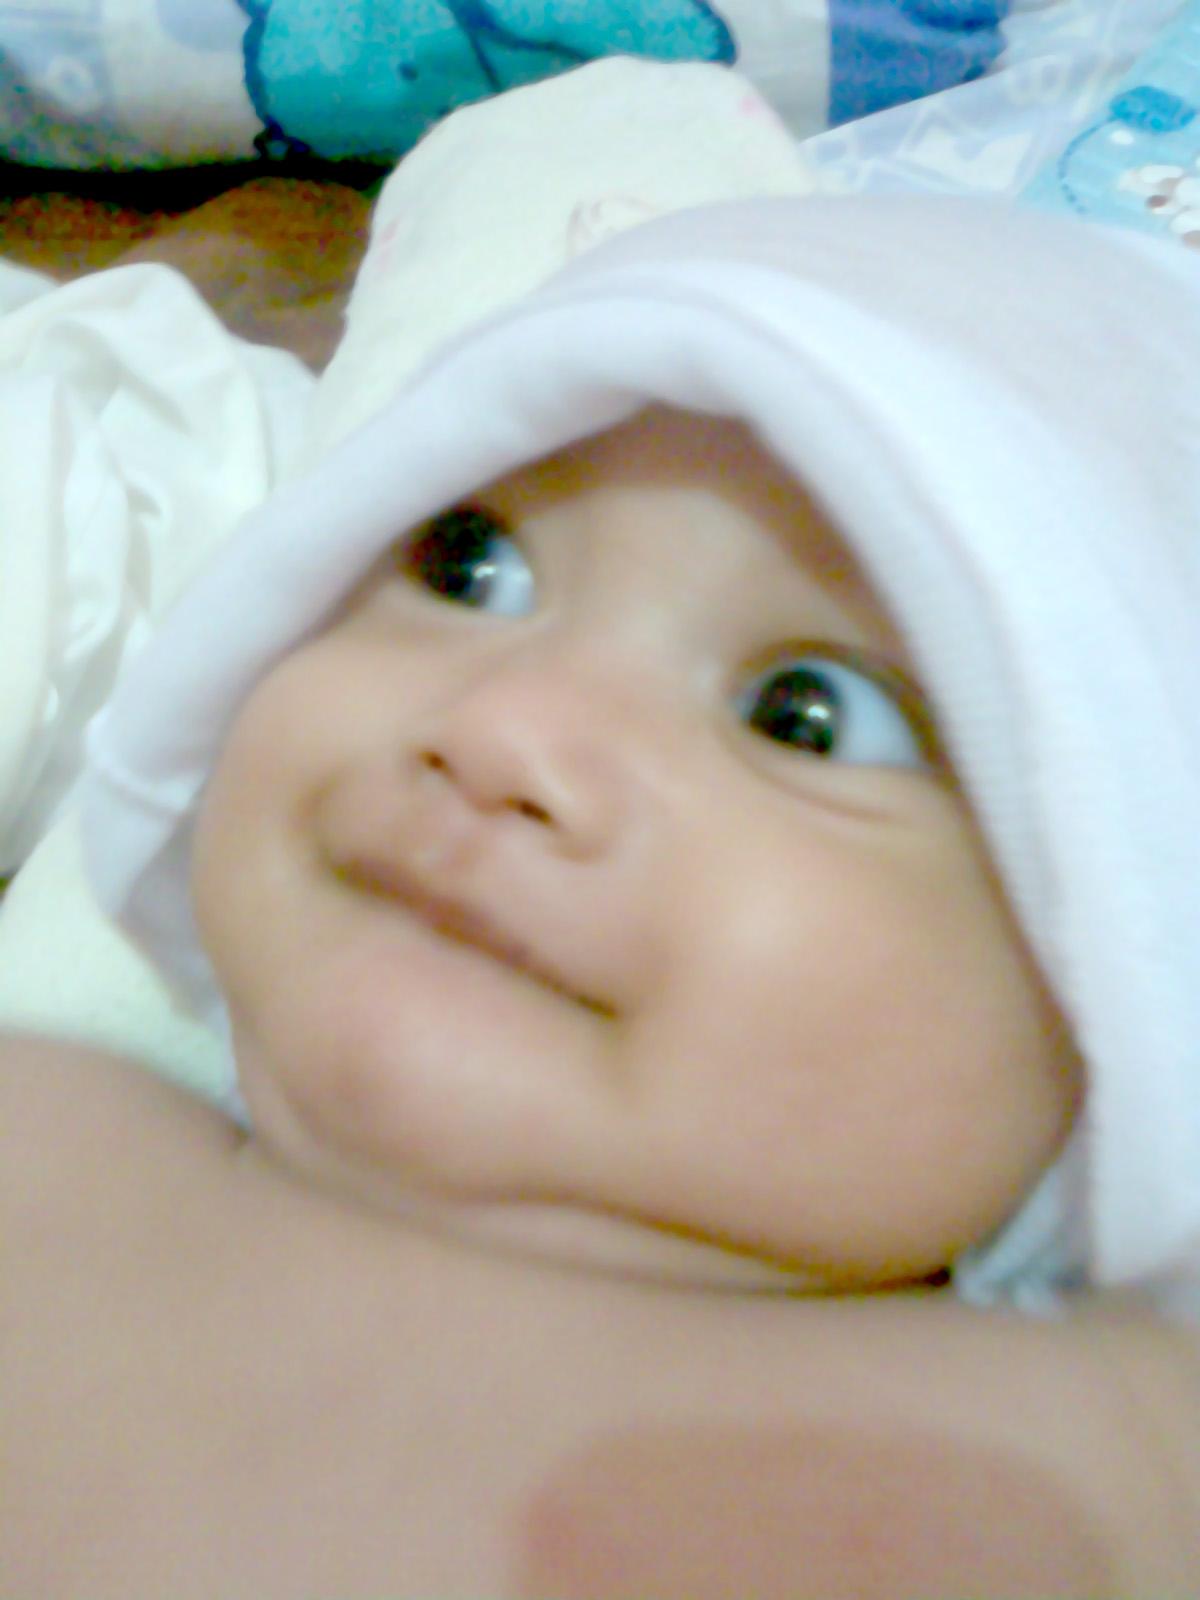 berikut perkembangan bayi normal sejak usia 0 4 bulan bulan ke 1 ...